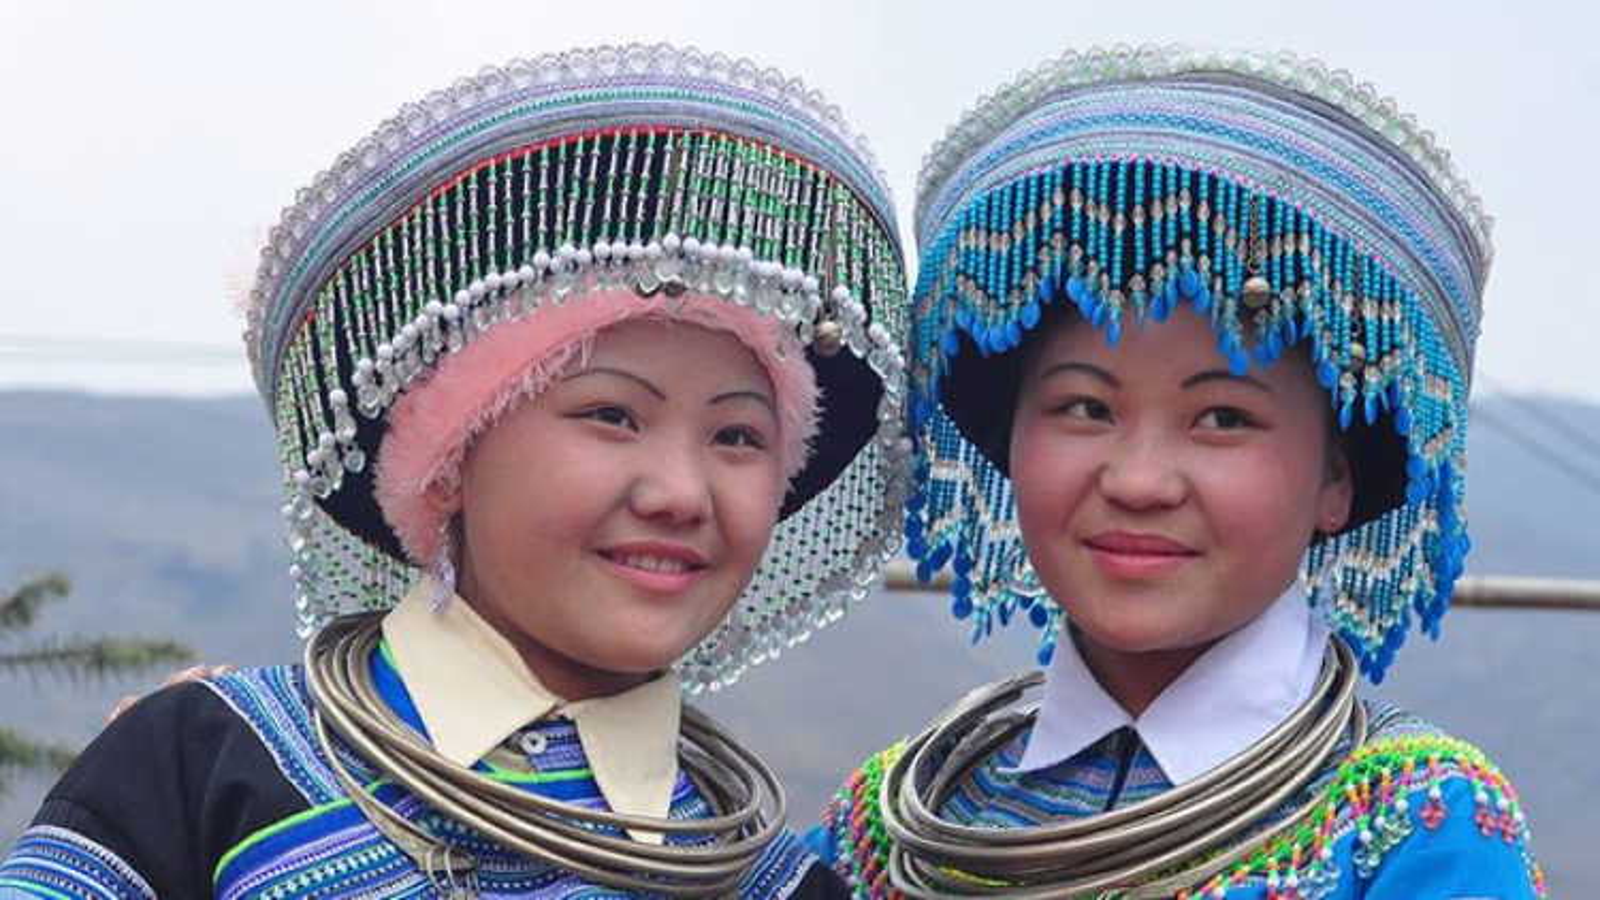 Colourful headdresses of ethnic girls in northwestern mountainous region